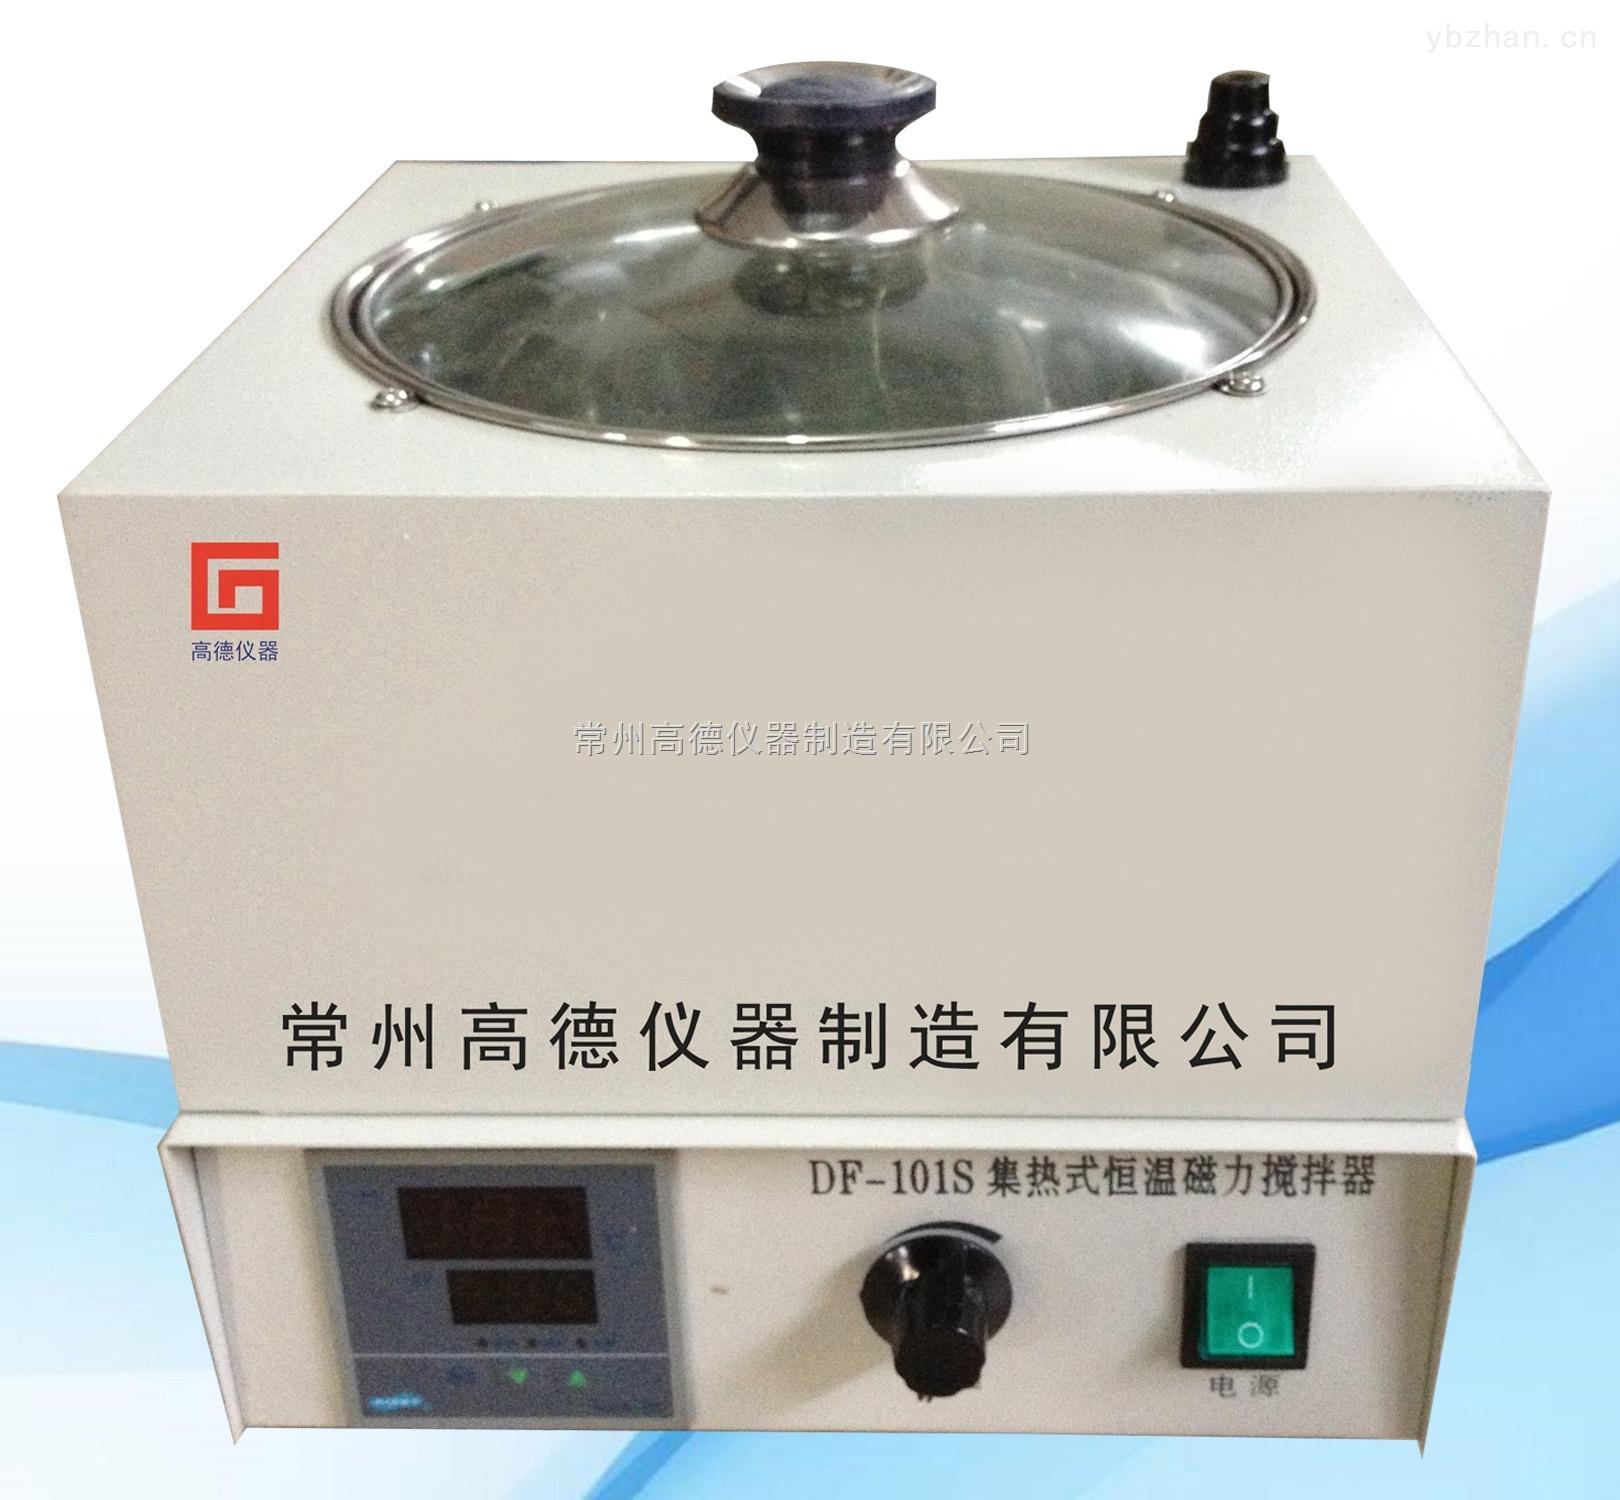 DF-101S-集熱式磁力攪拌器